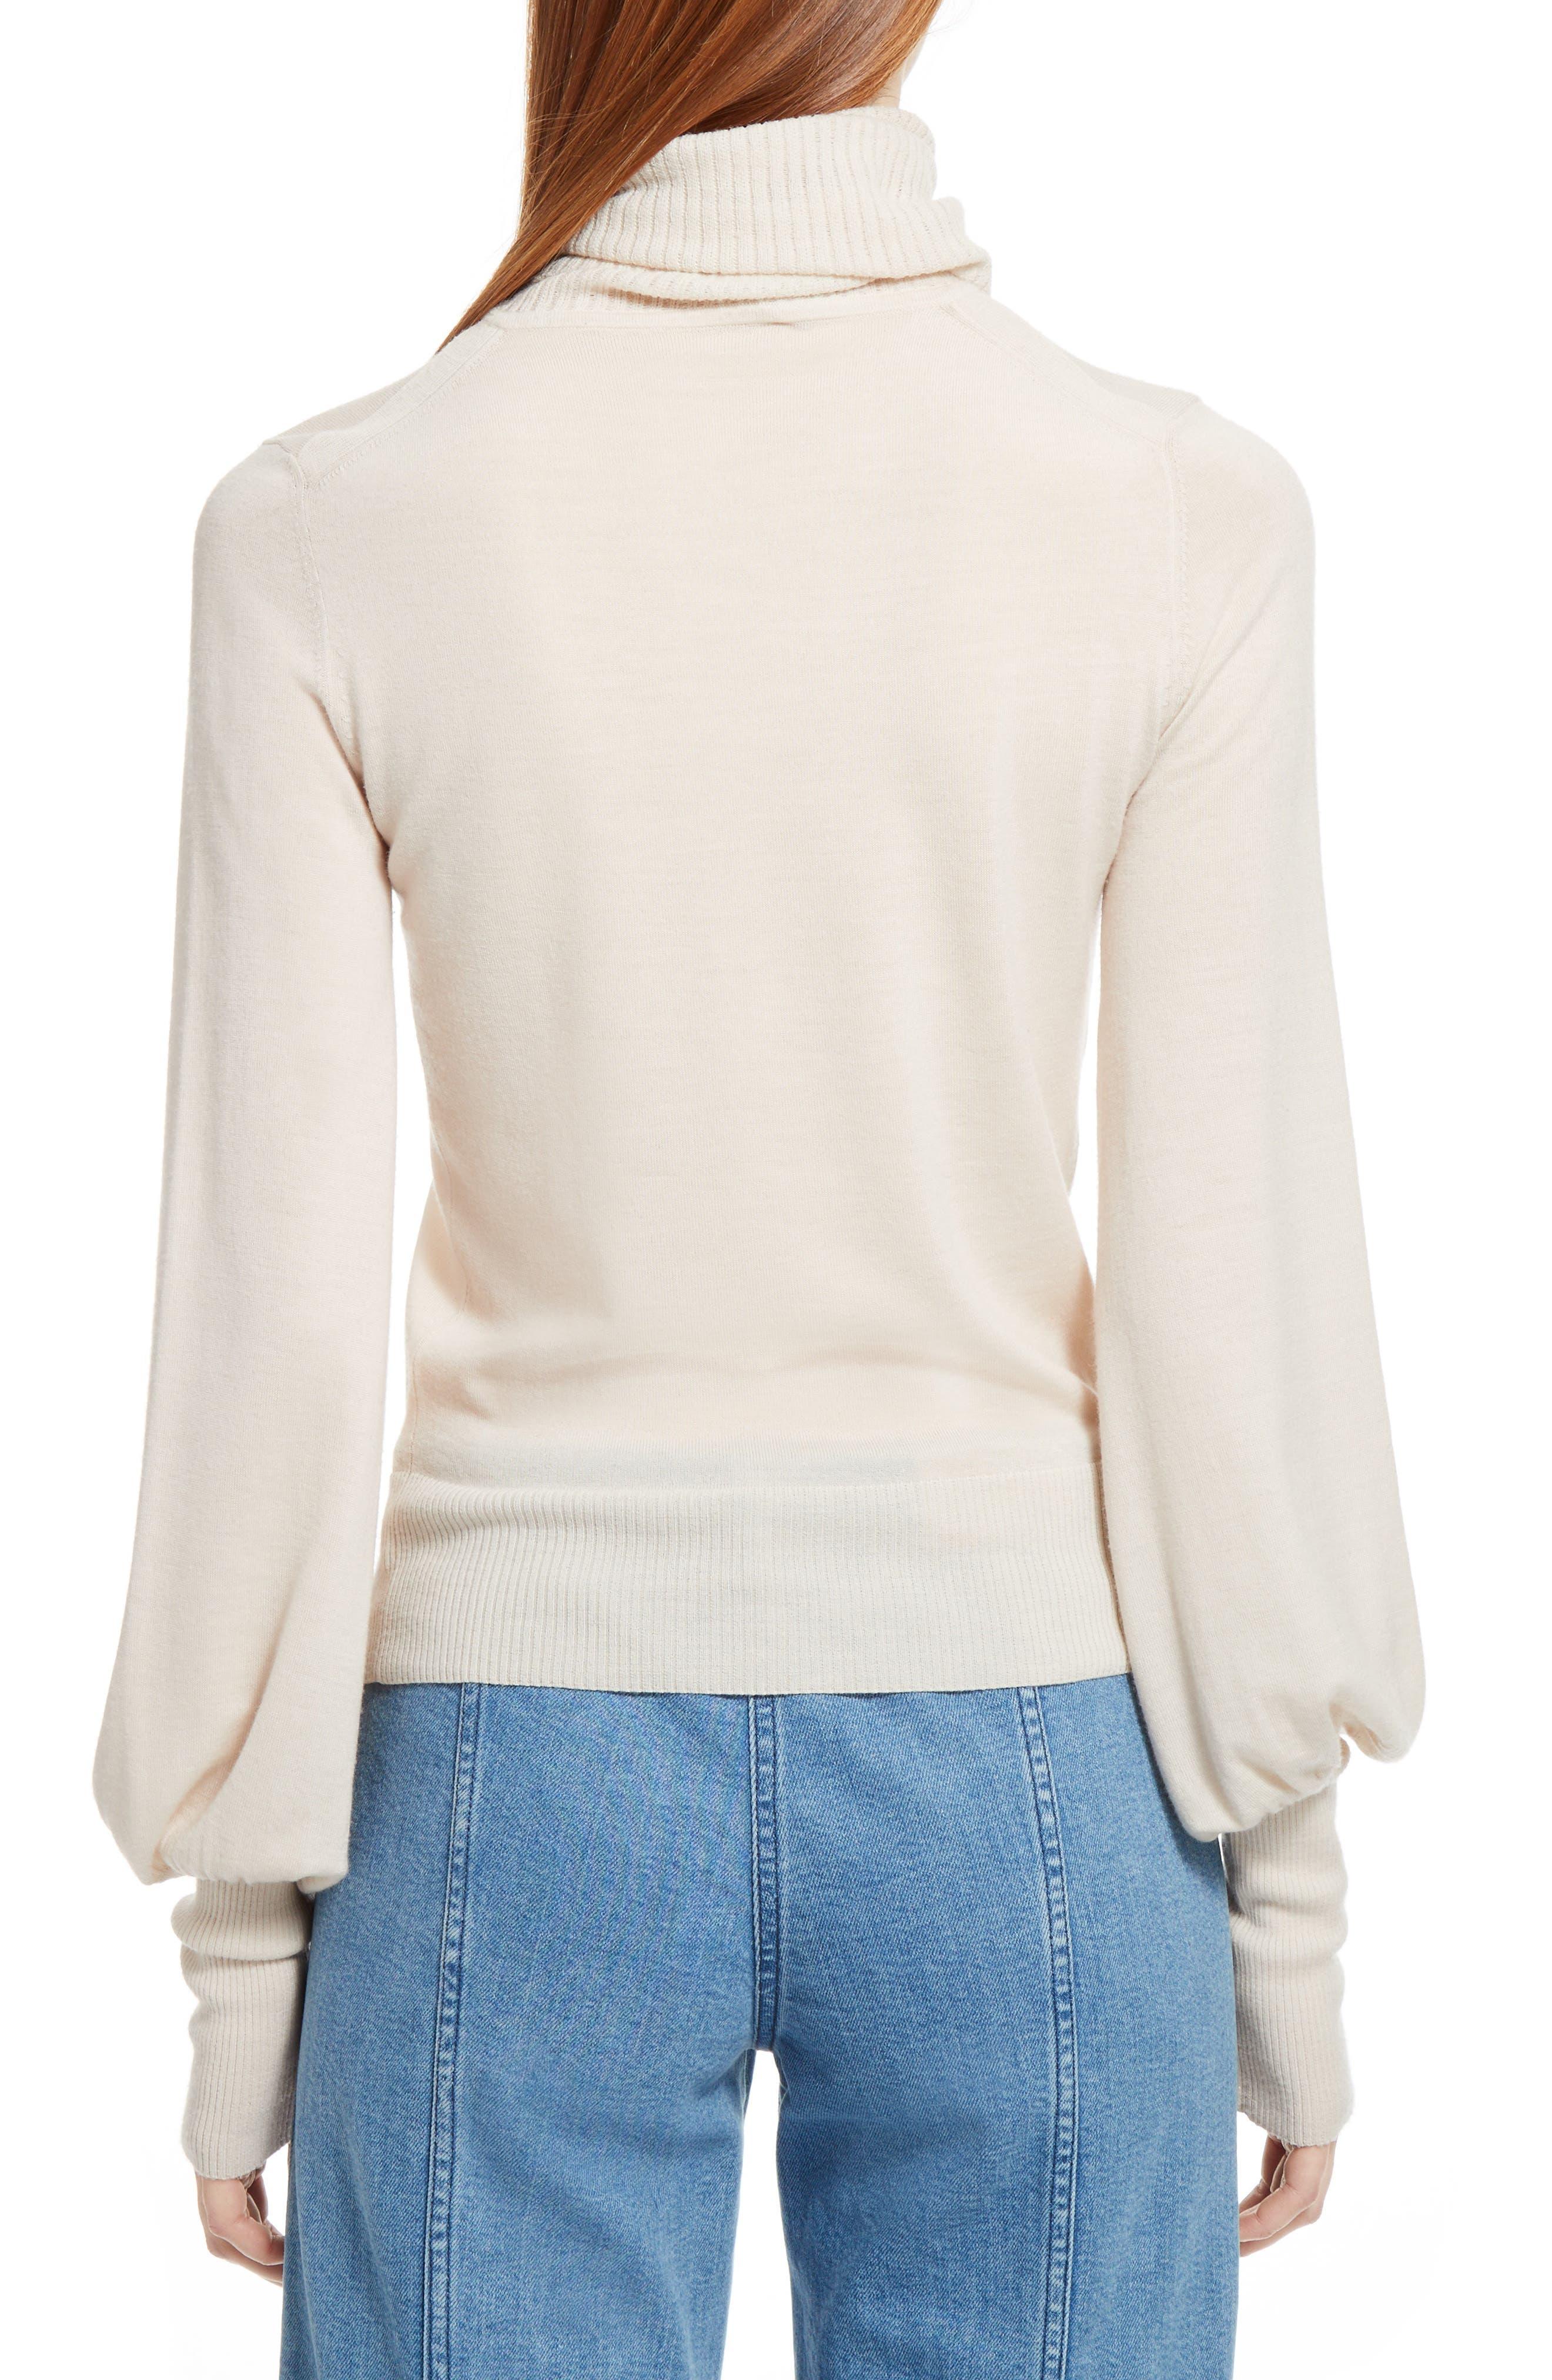 Wool Turtleneck Sweater,                             Alternate thumbnail 2, color,                             901